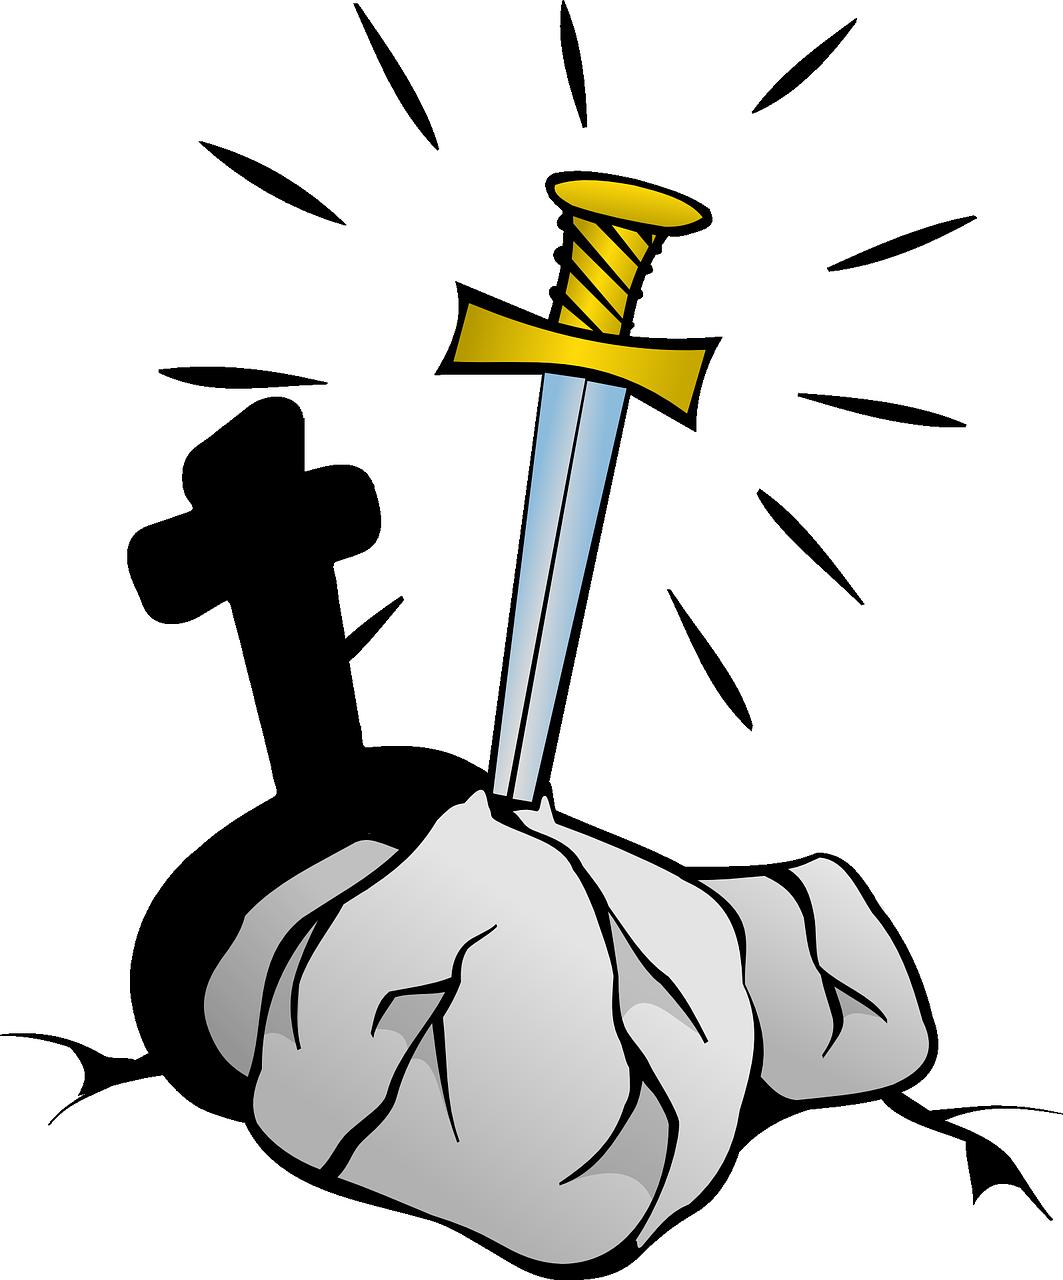 1063x1280 Excalibur Legend Sword England Transparent Image Sword